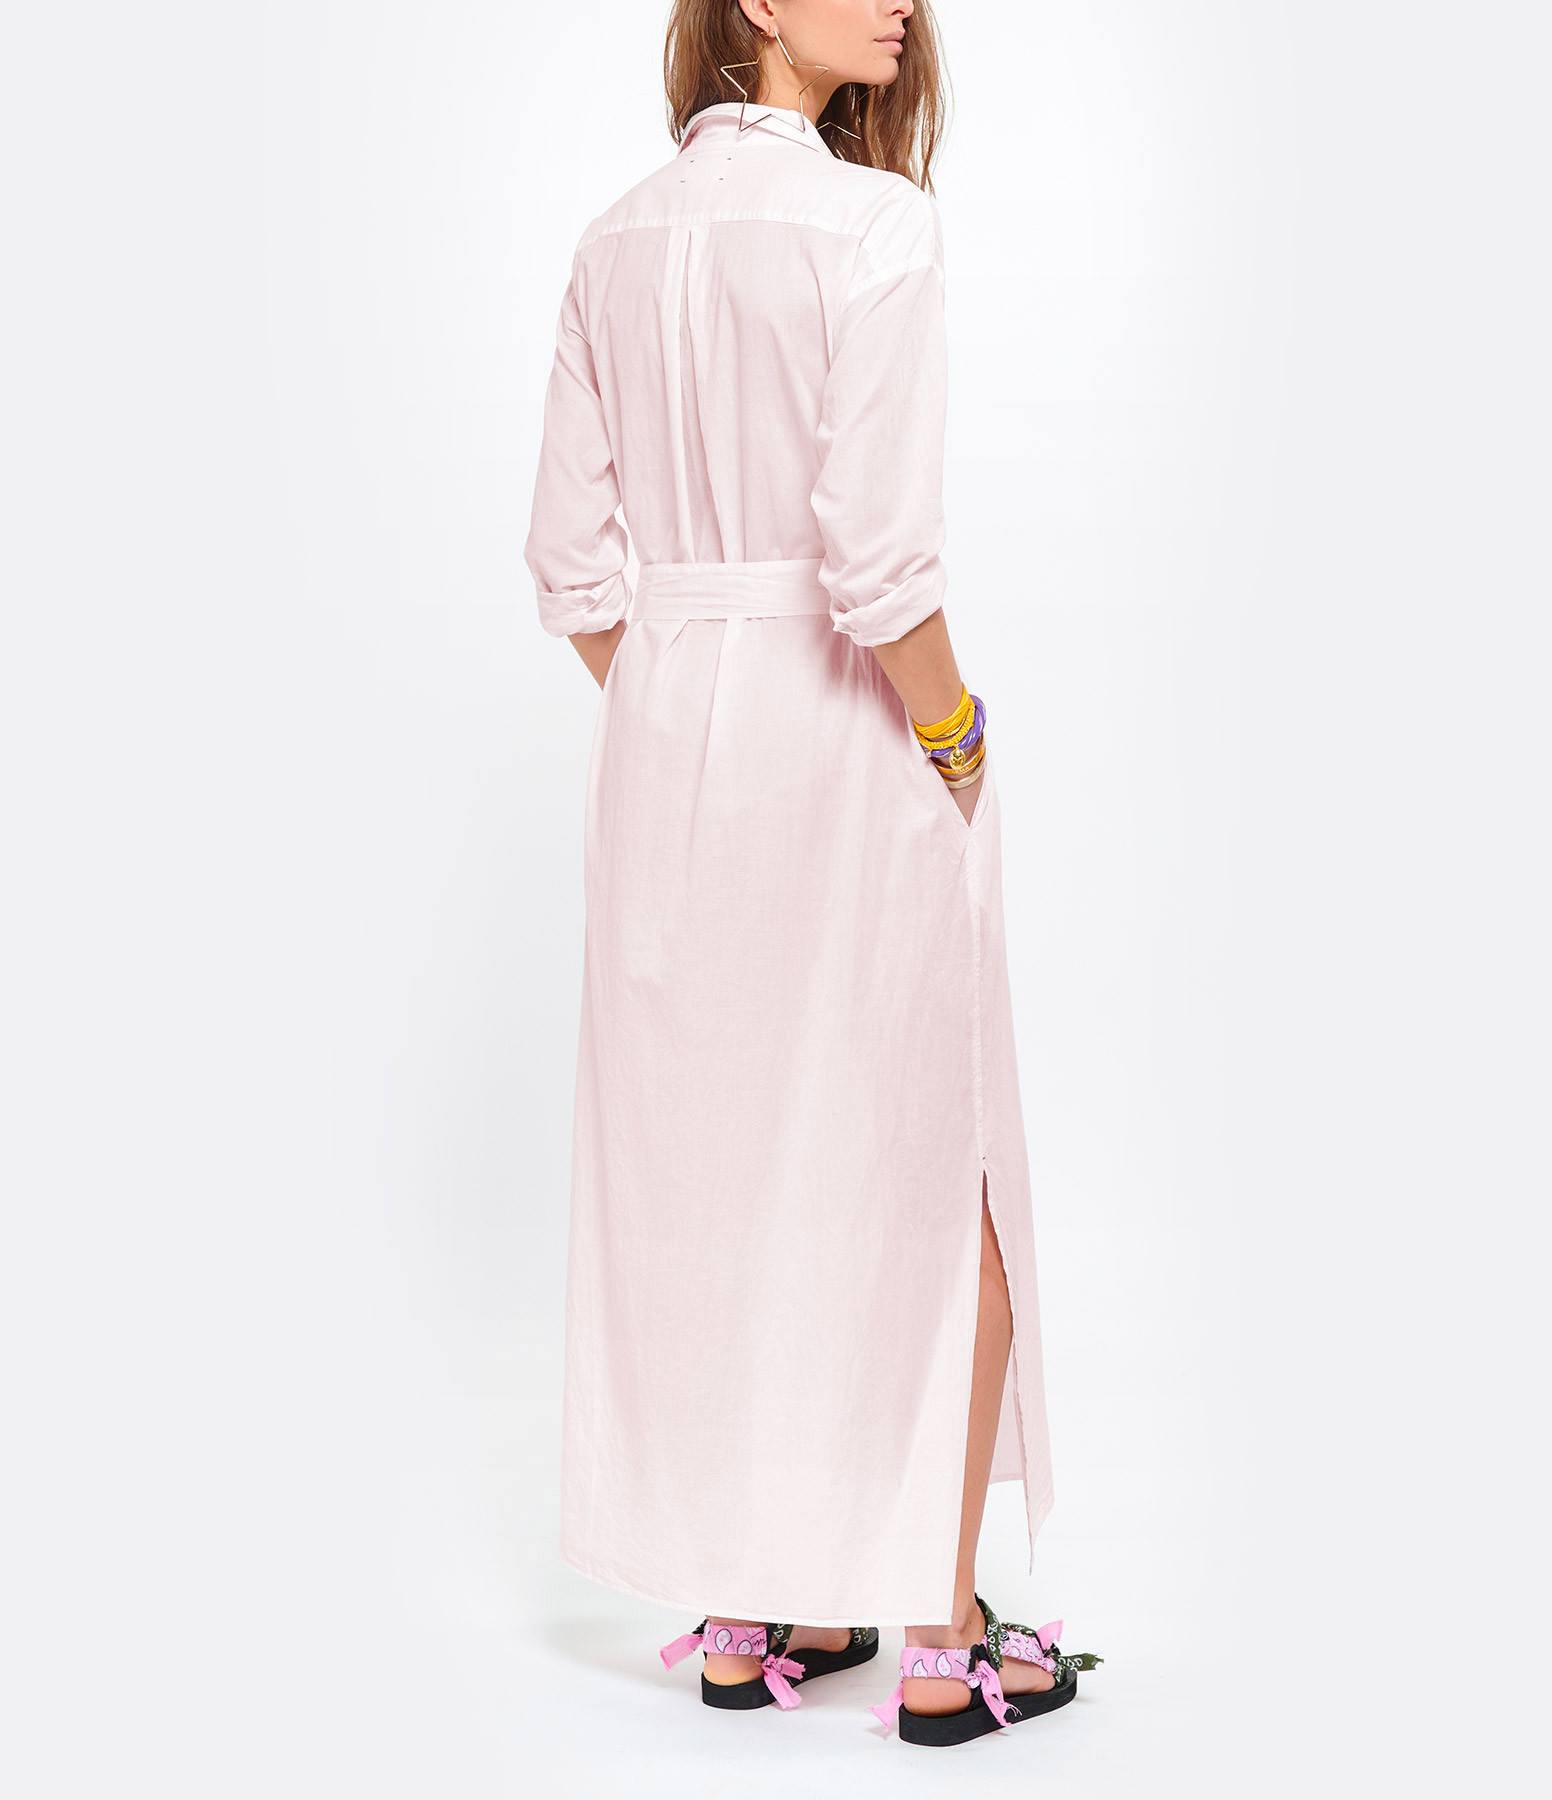 XIRENA - Robe Hope Lilas